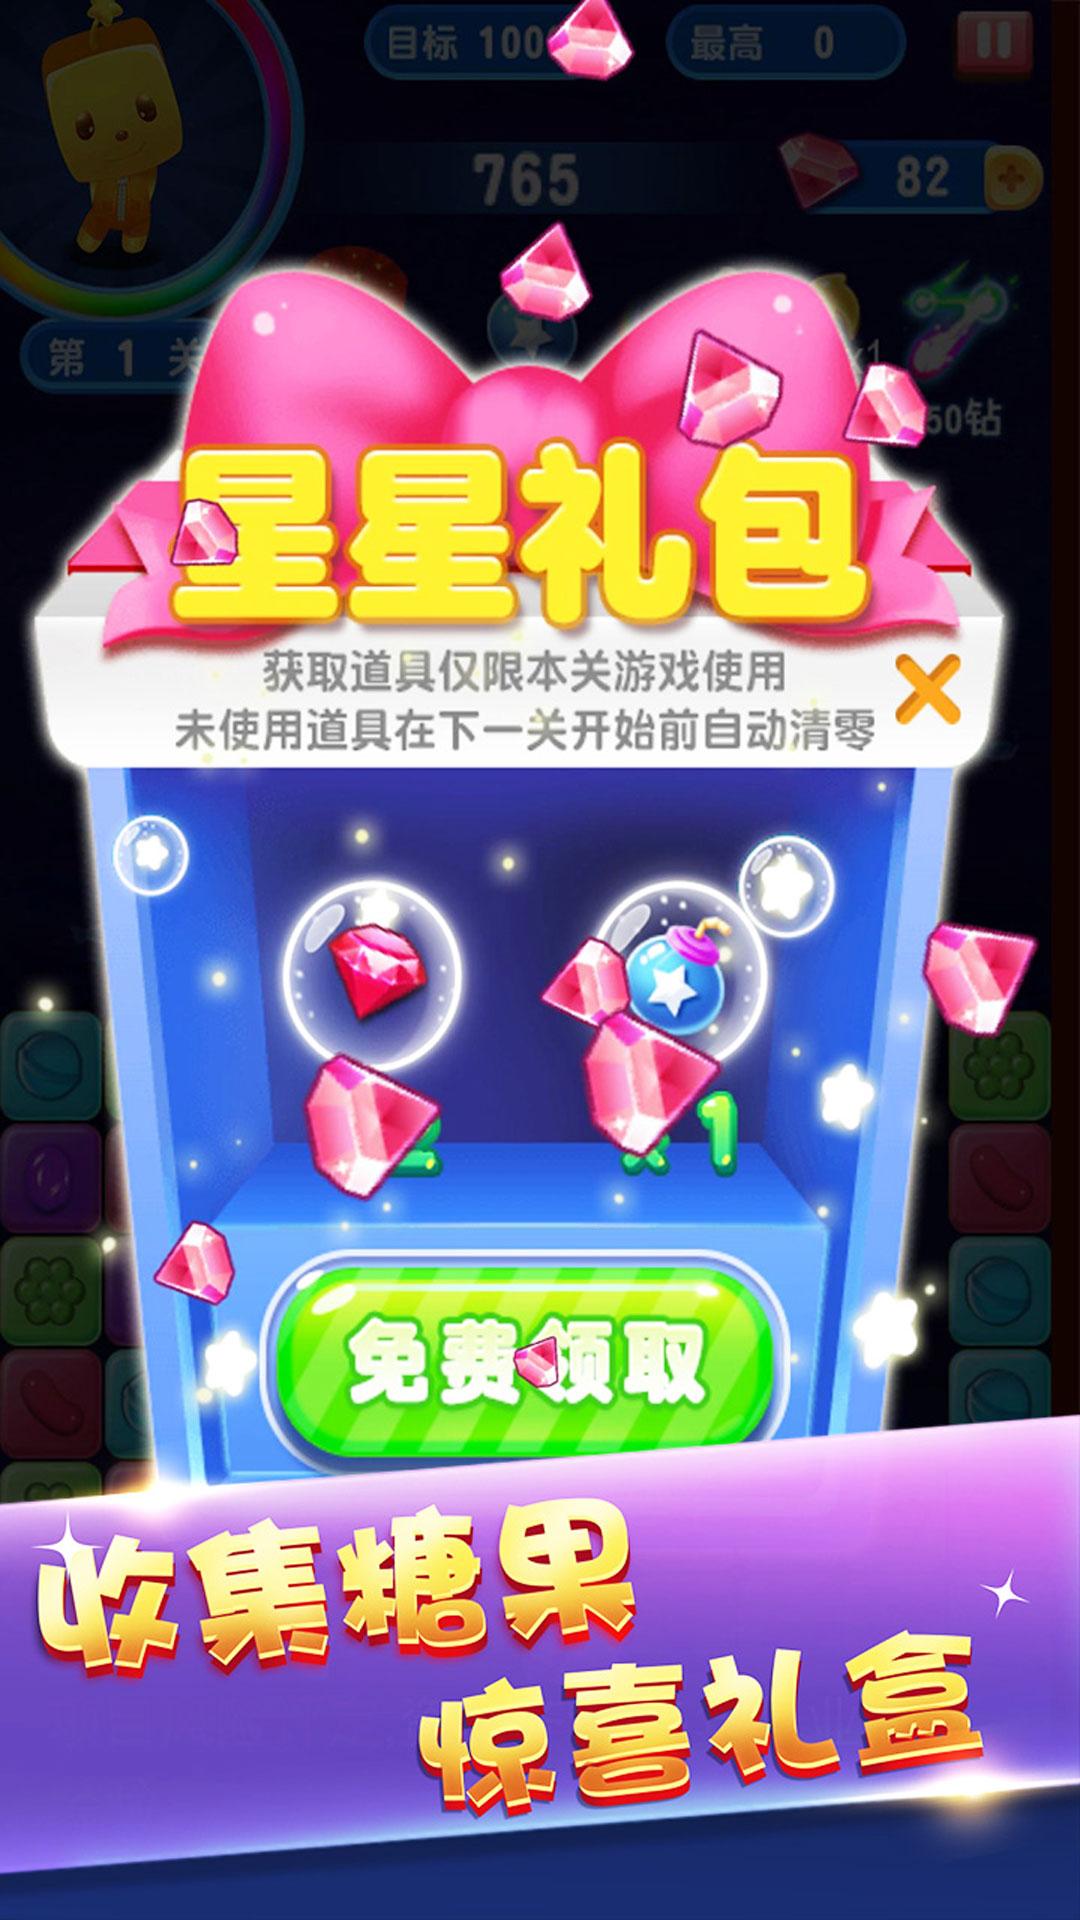 Lollipop棒棒糖:甜蜜3消